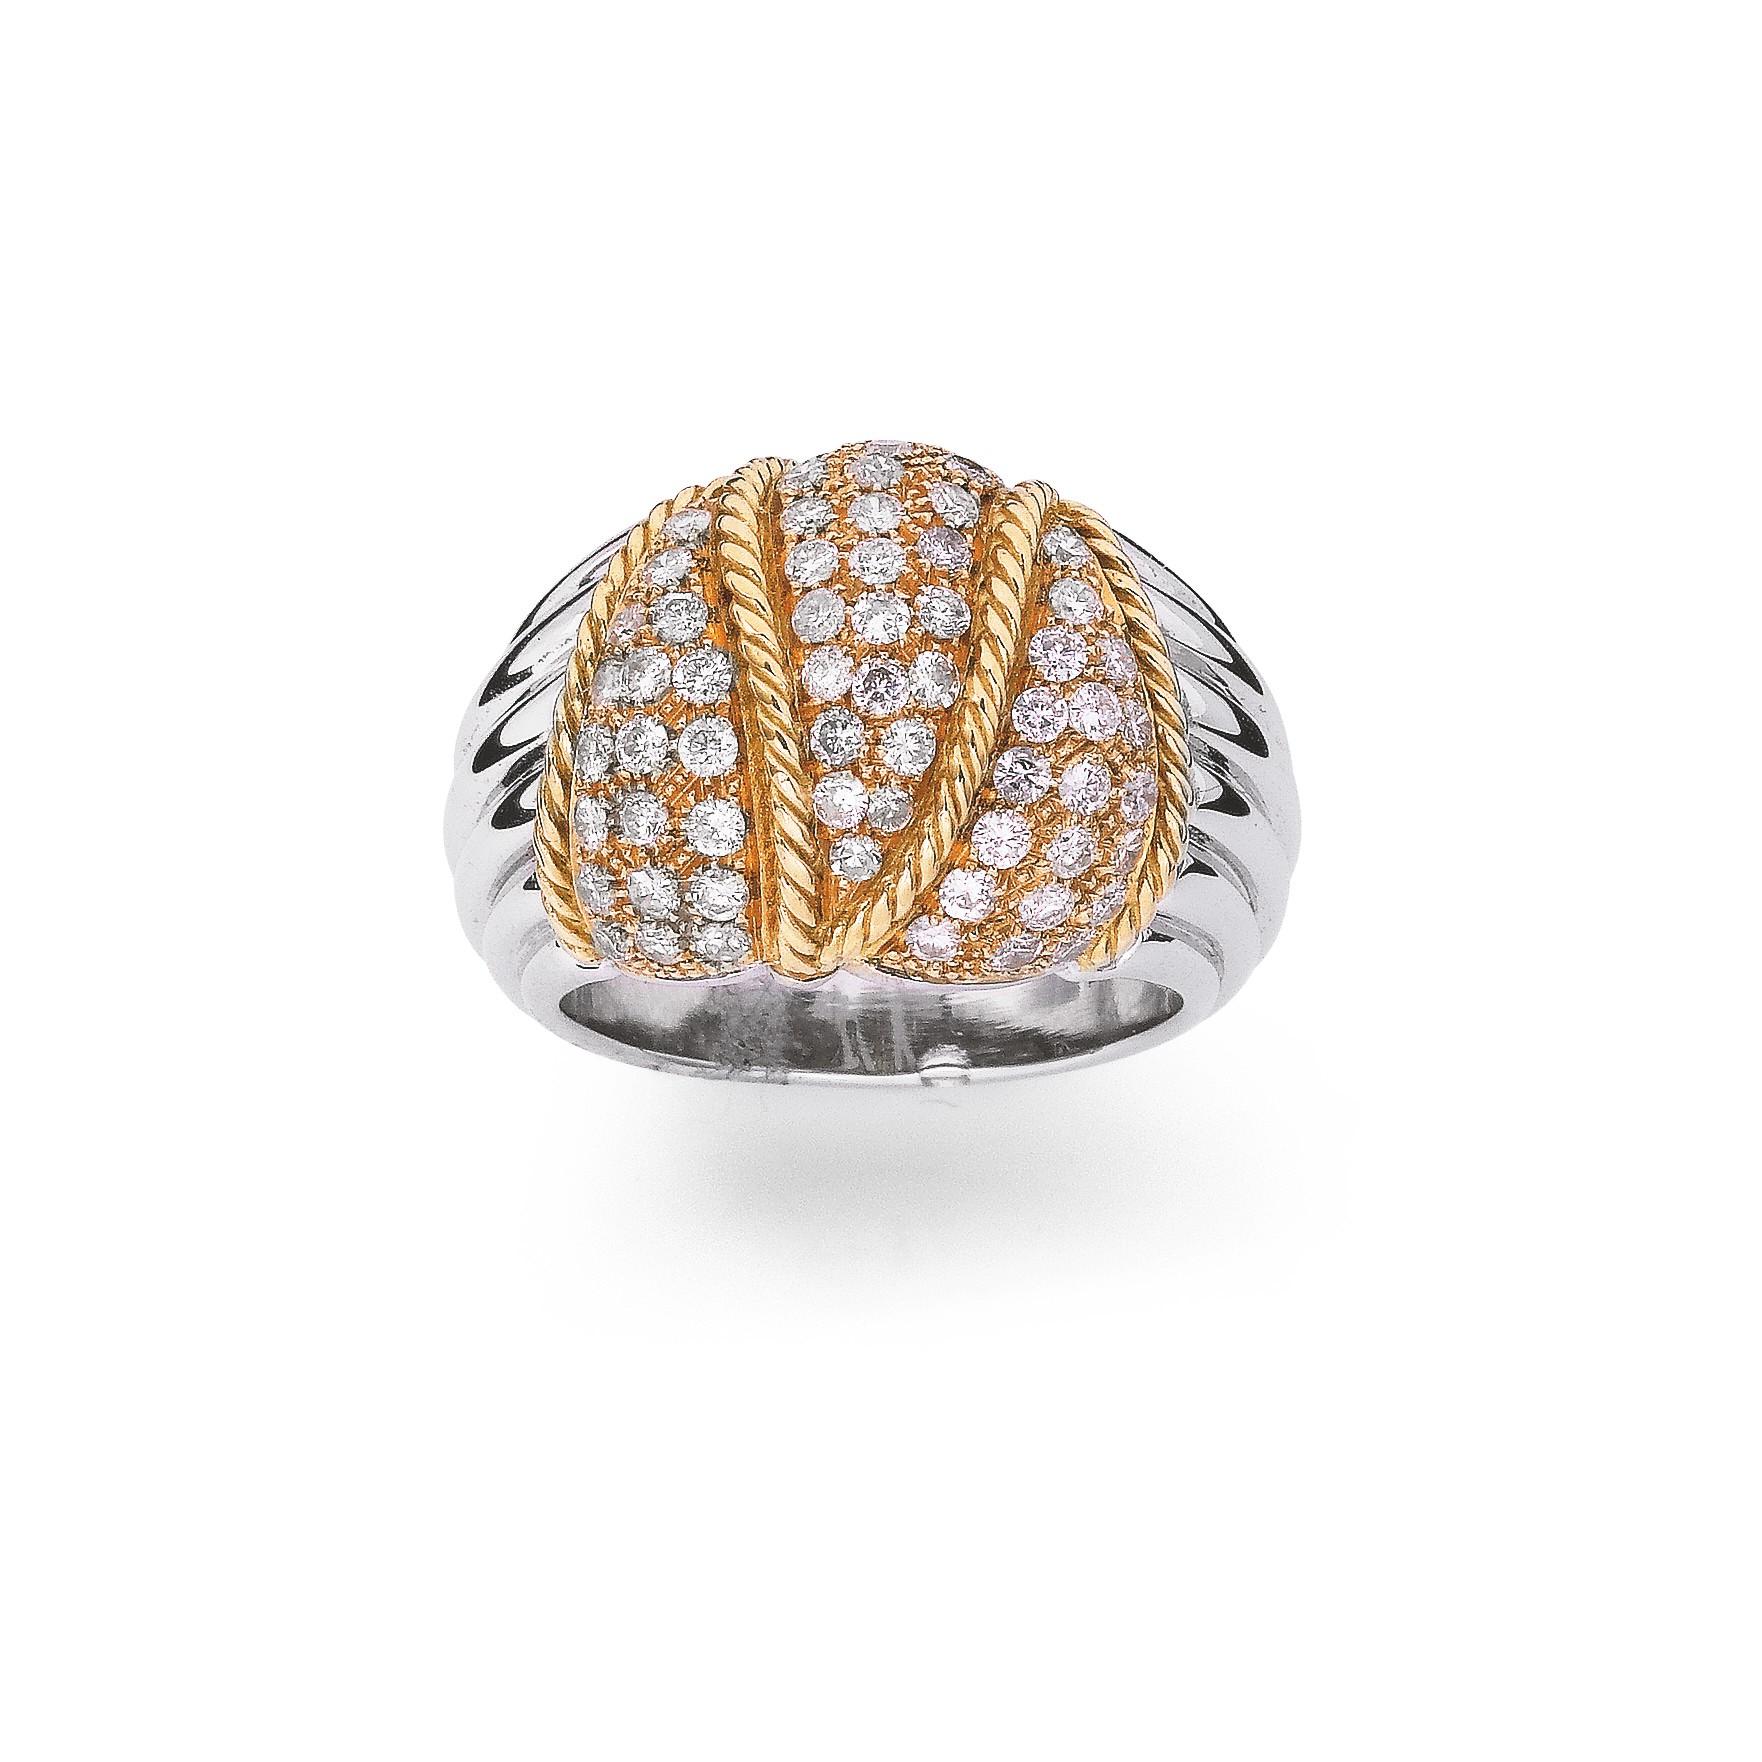 Diamond ring [Bague diamants]